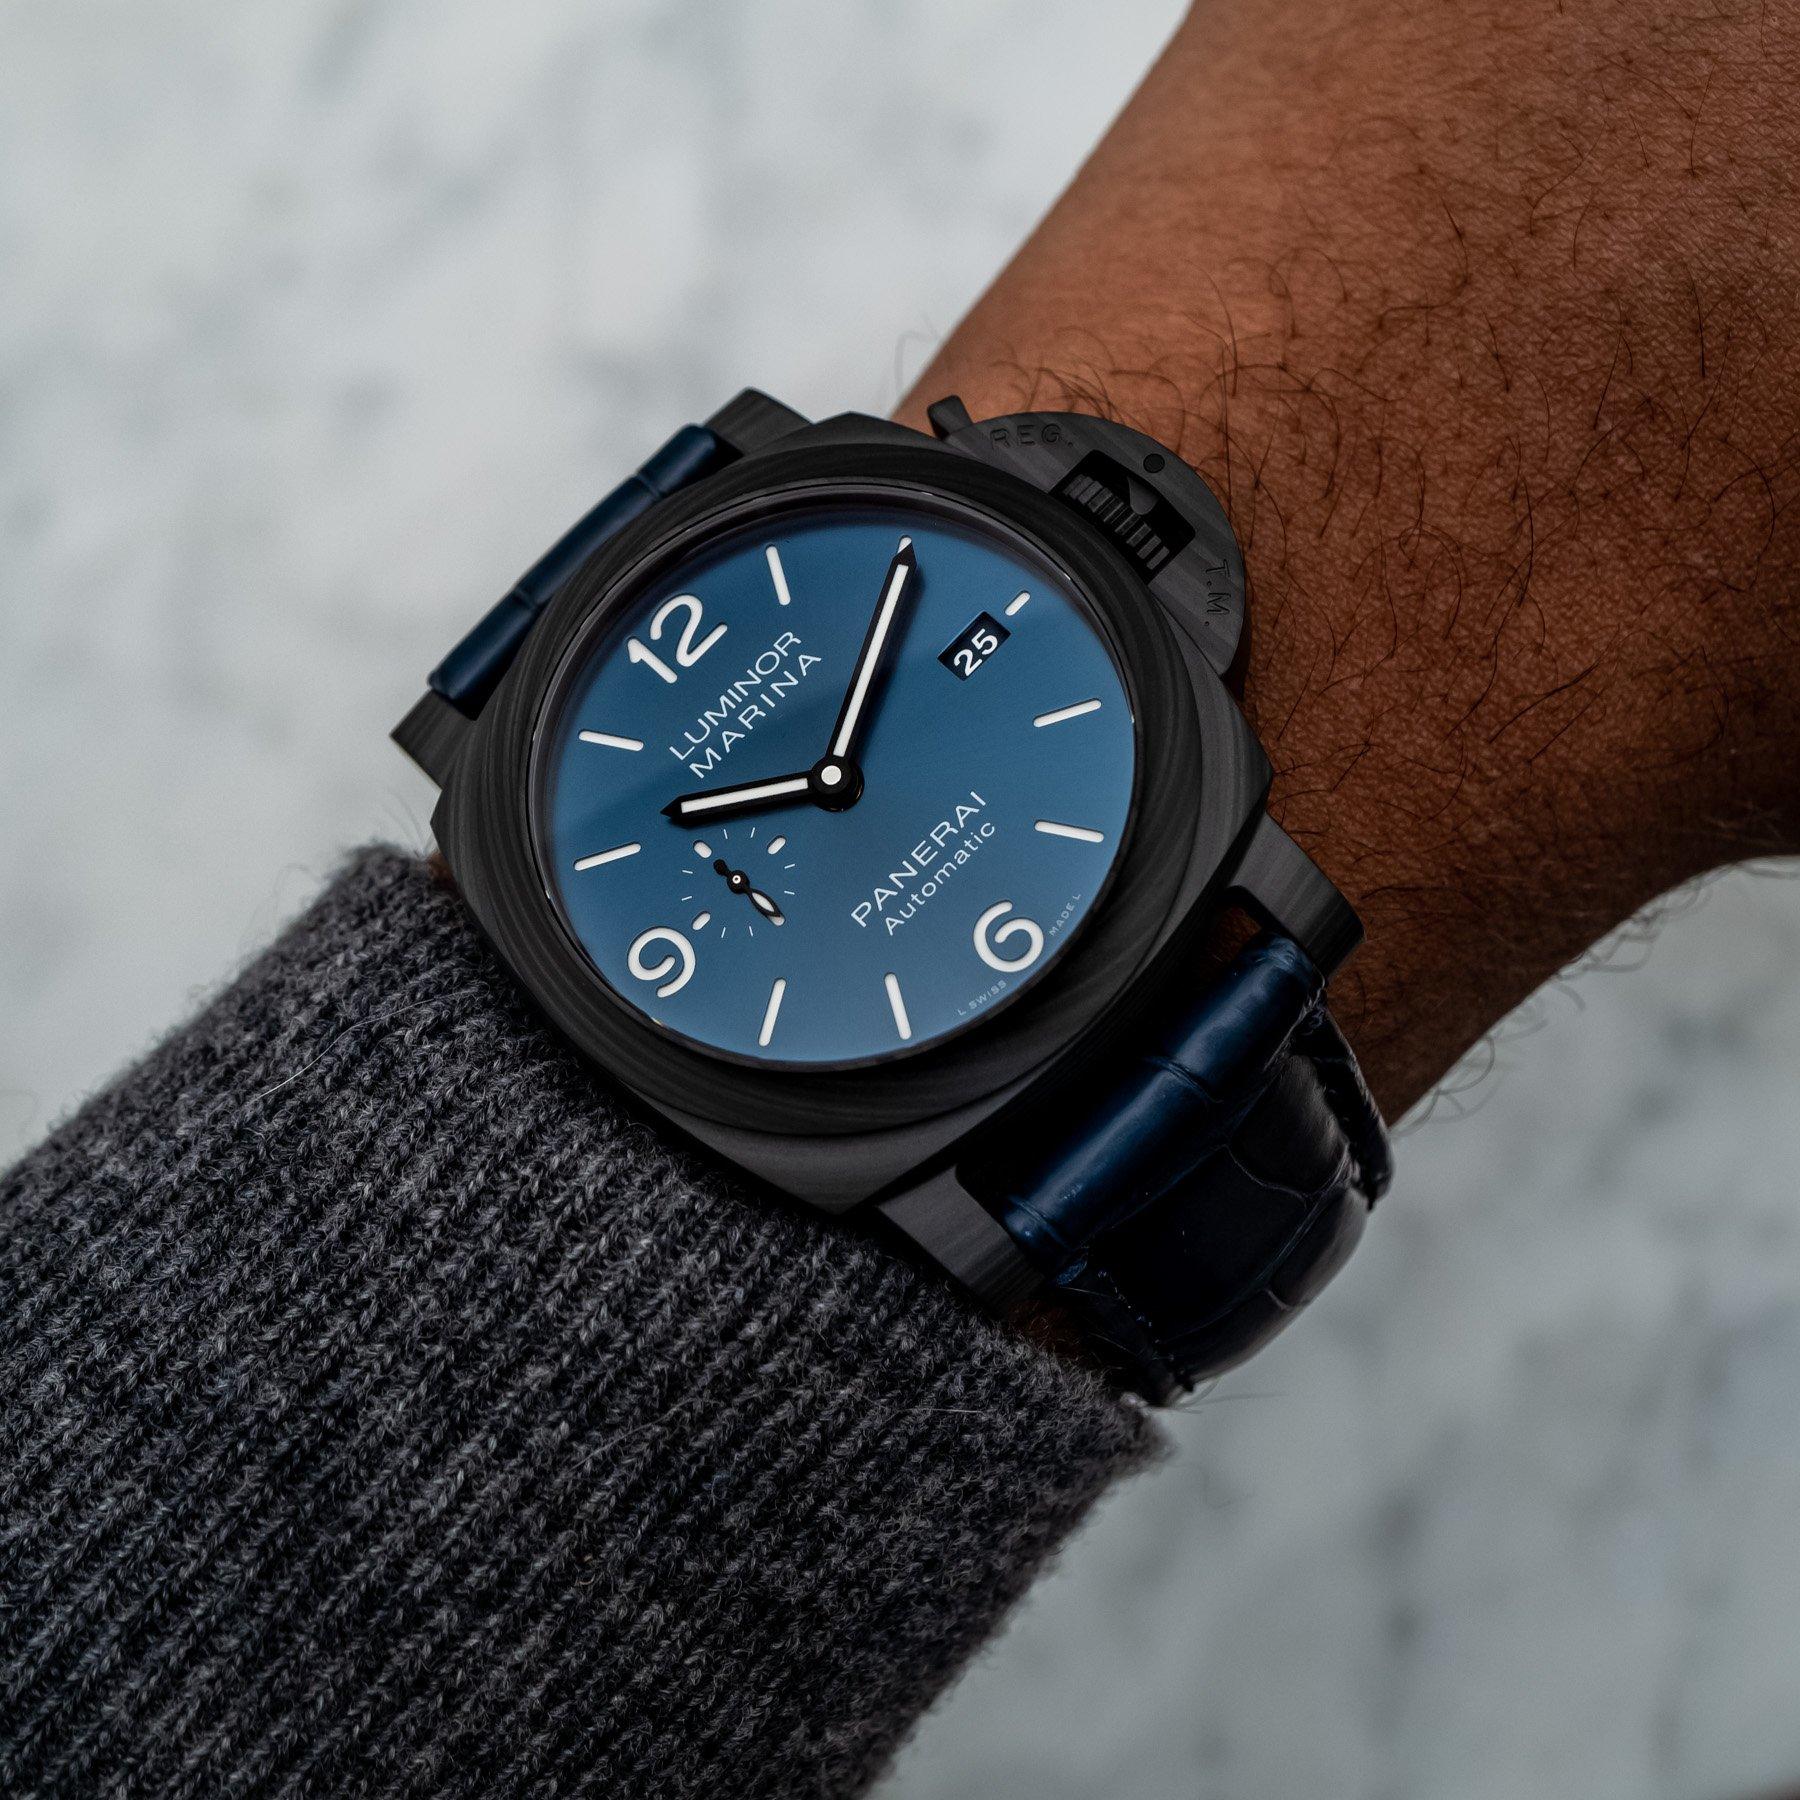 Часы Panerai Luminor Marina Carbotech Blu Notte PAM1664